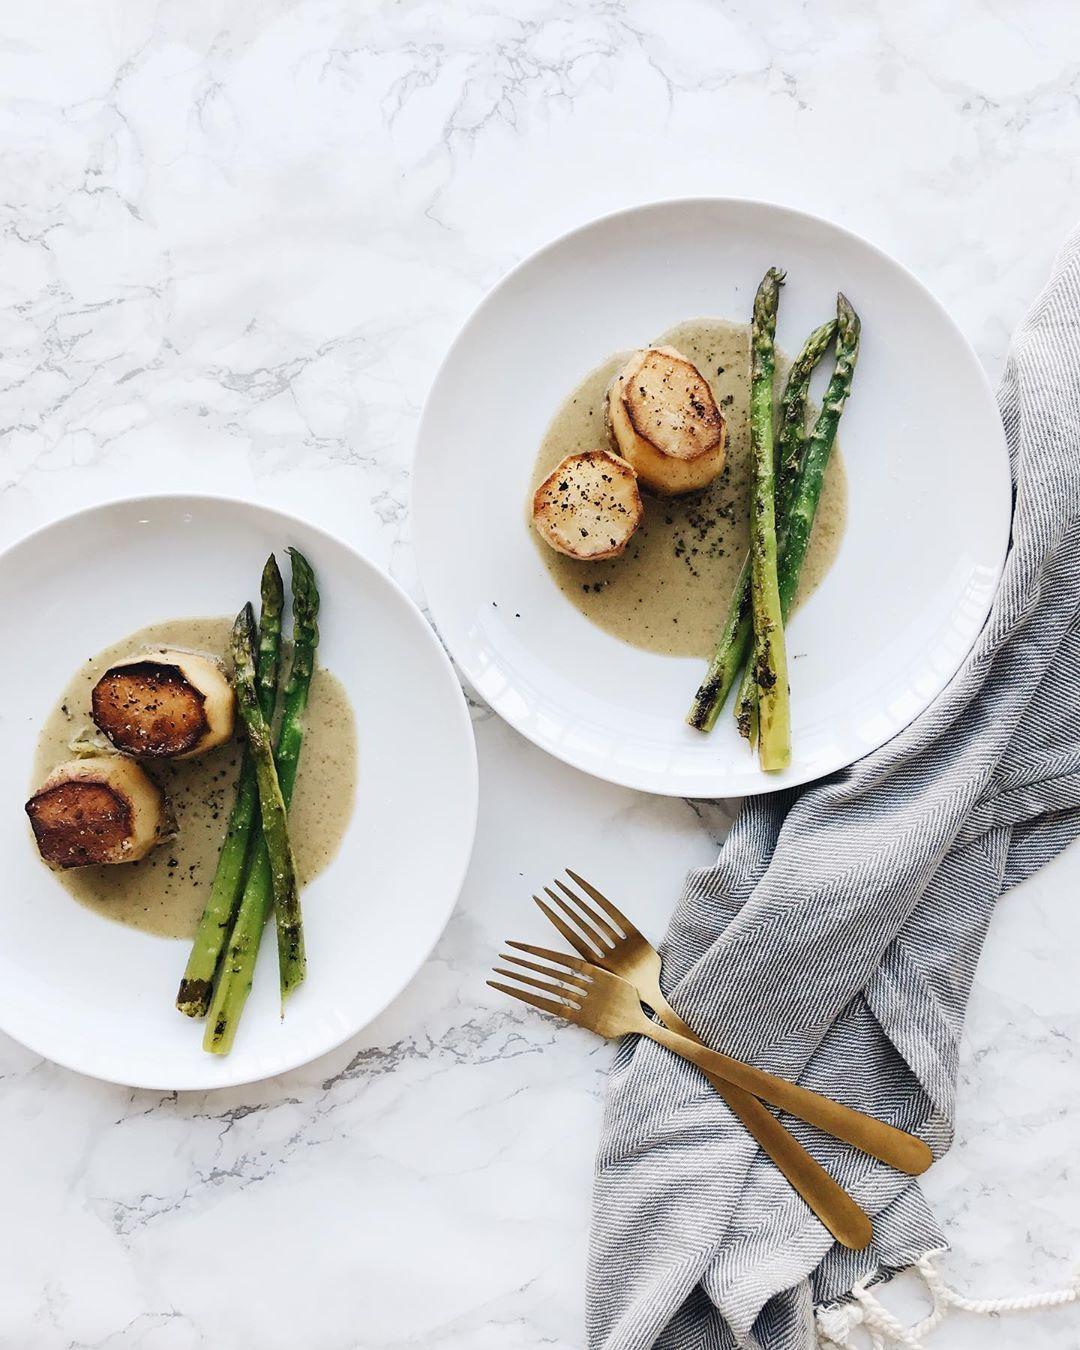 Fondant potato, roasted asparagus, creamy broccoli garlic sauce IG